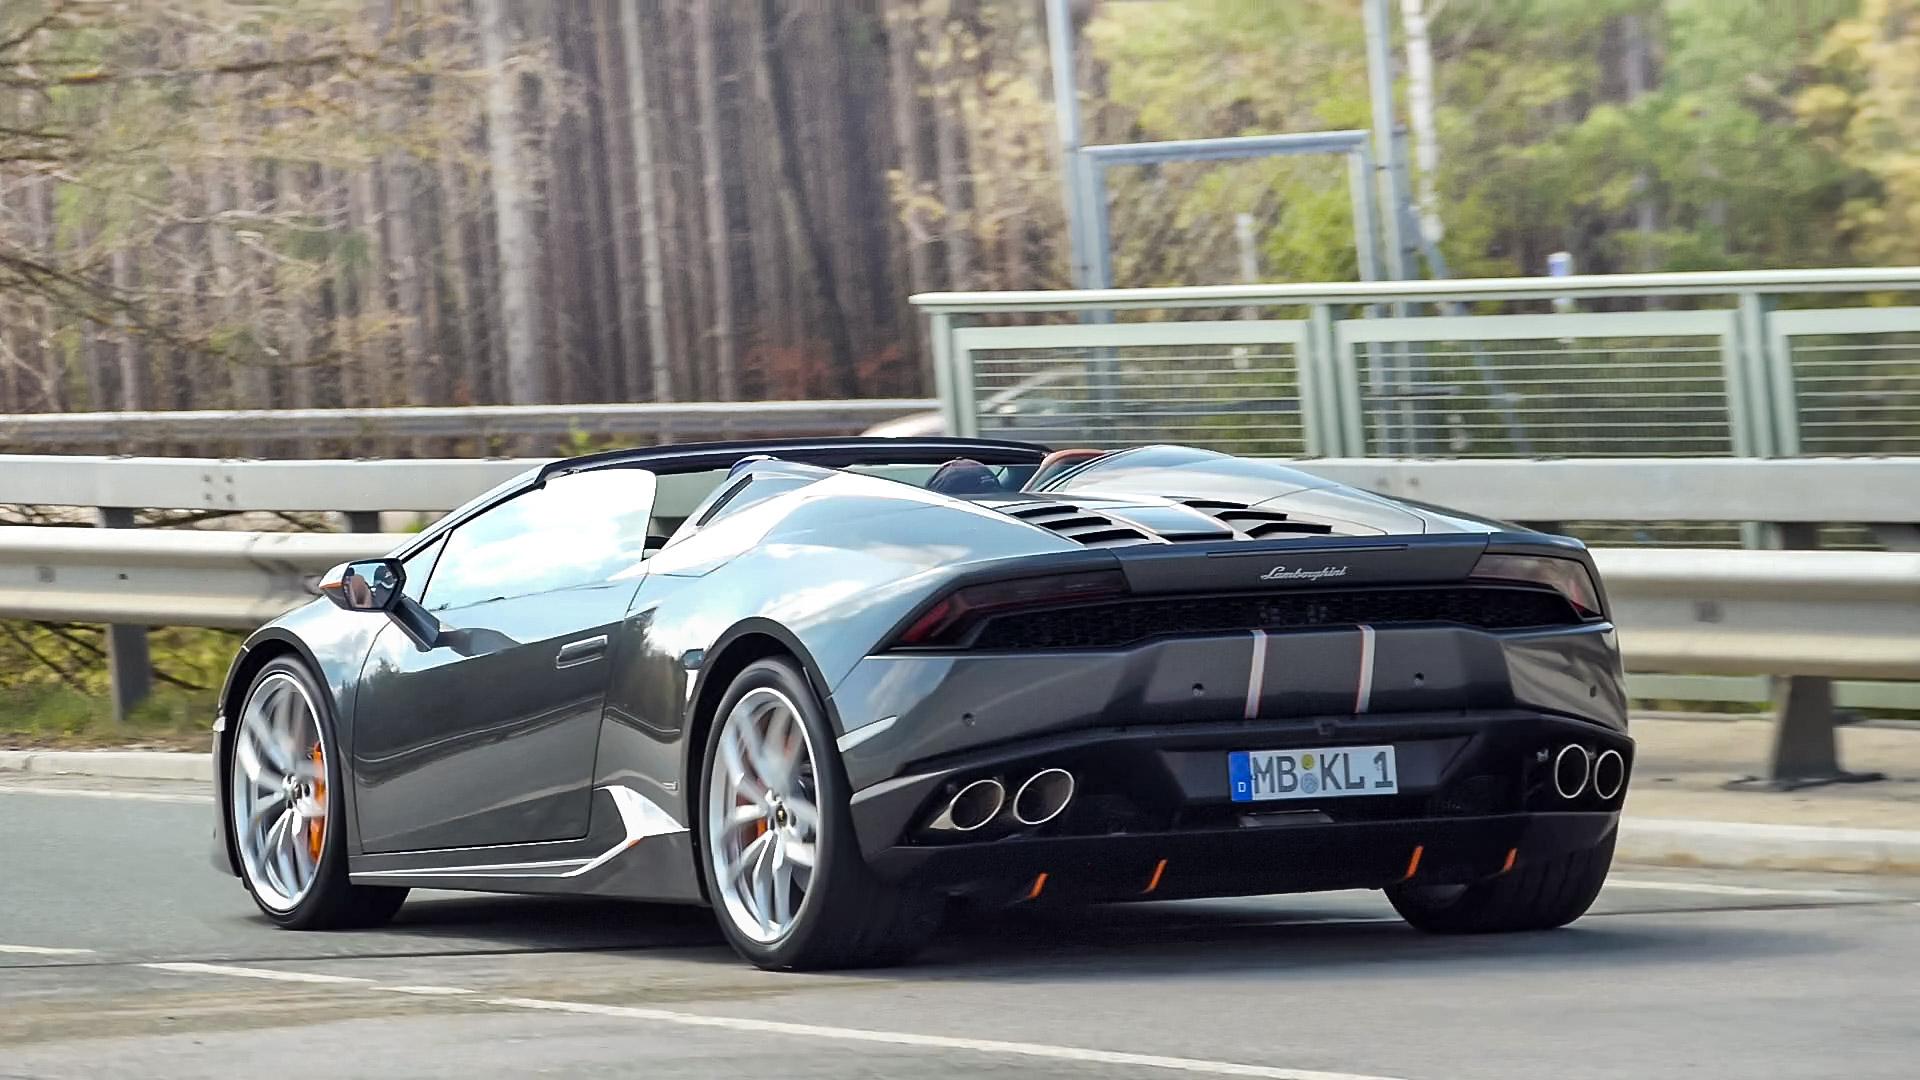 Lamborghini Huracan Spyder - MB-KL-1